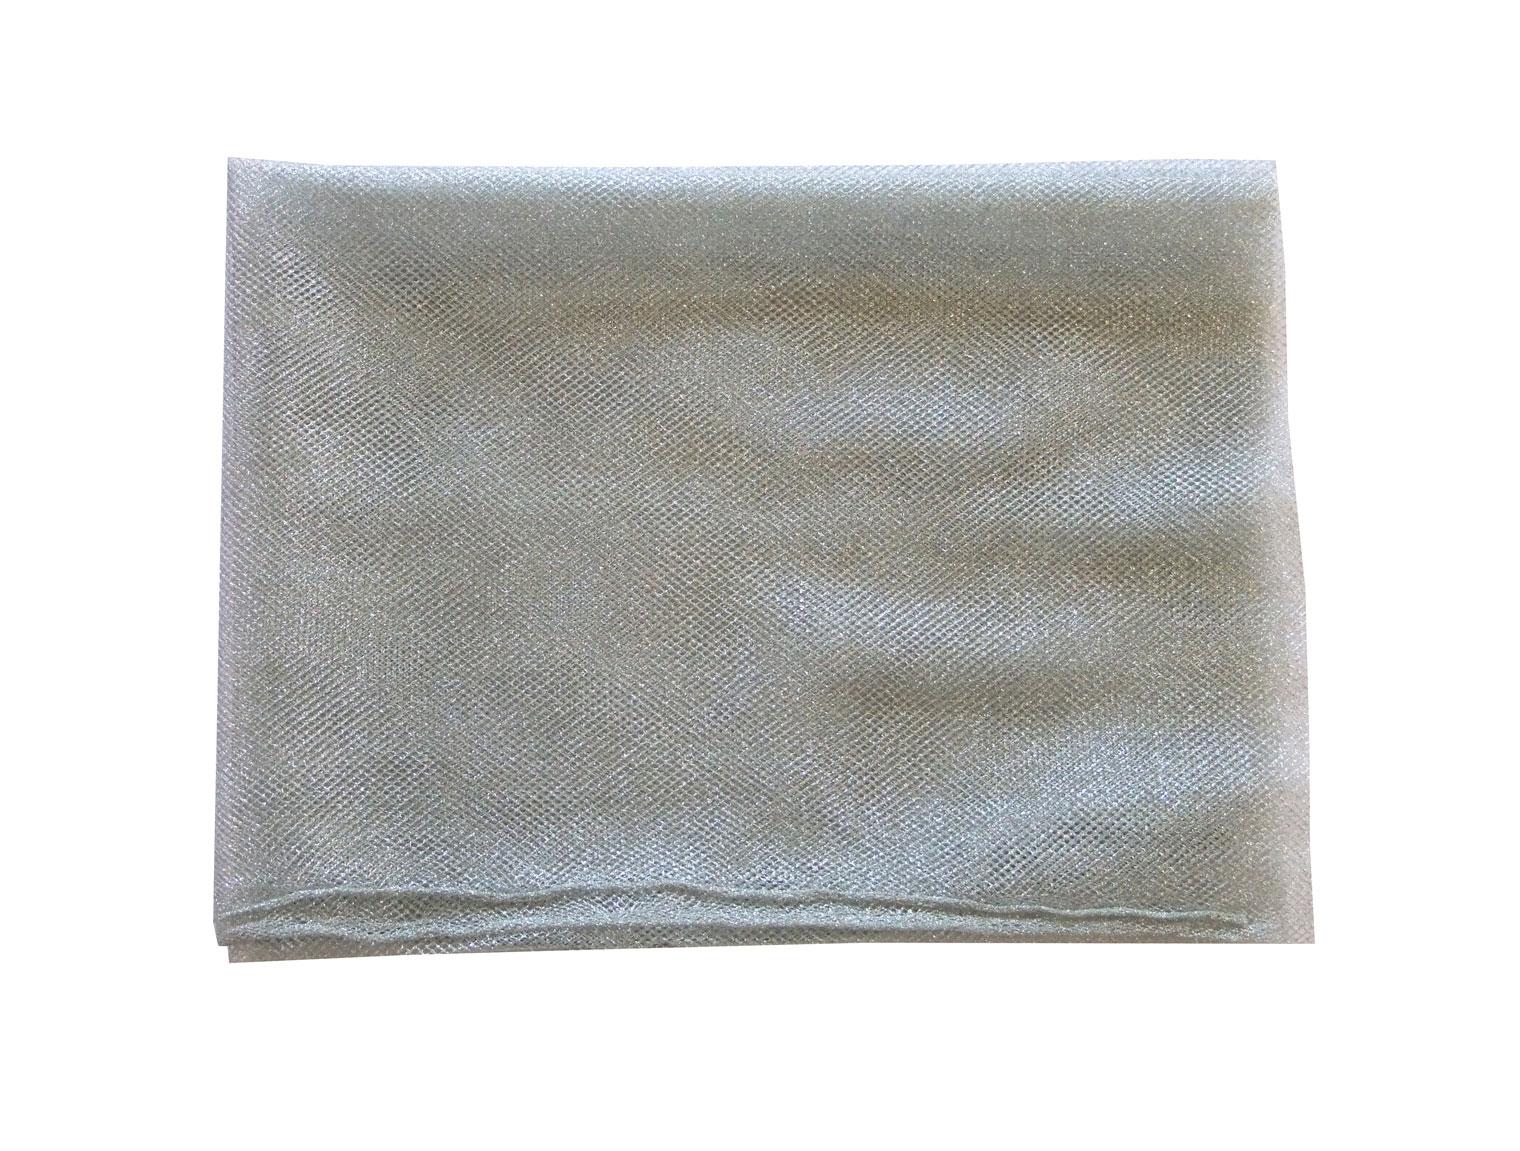 Metallic Silver Netting 91cm Wide (A Choice of Lengths)  03ed732e8